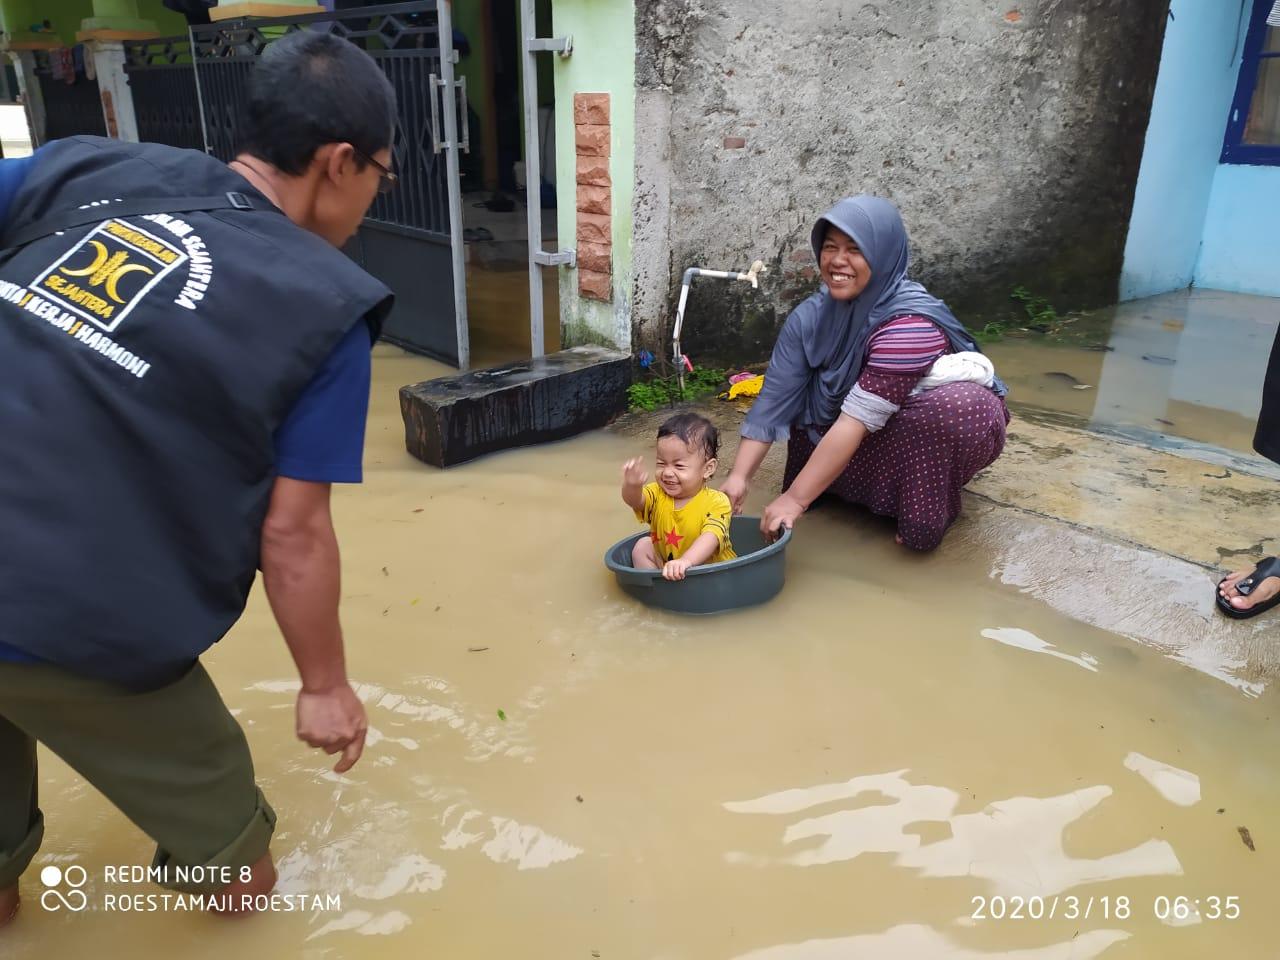 Maut Corona Mengintai, PKS Tetap Bantu Korban Banjir di Tigaraksa